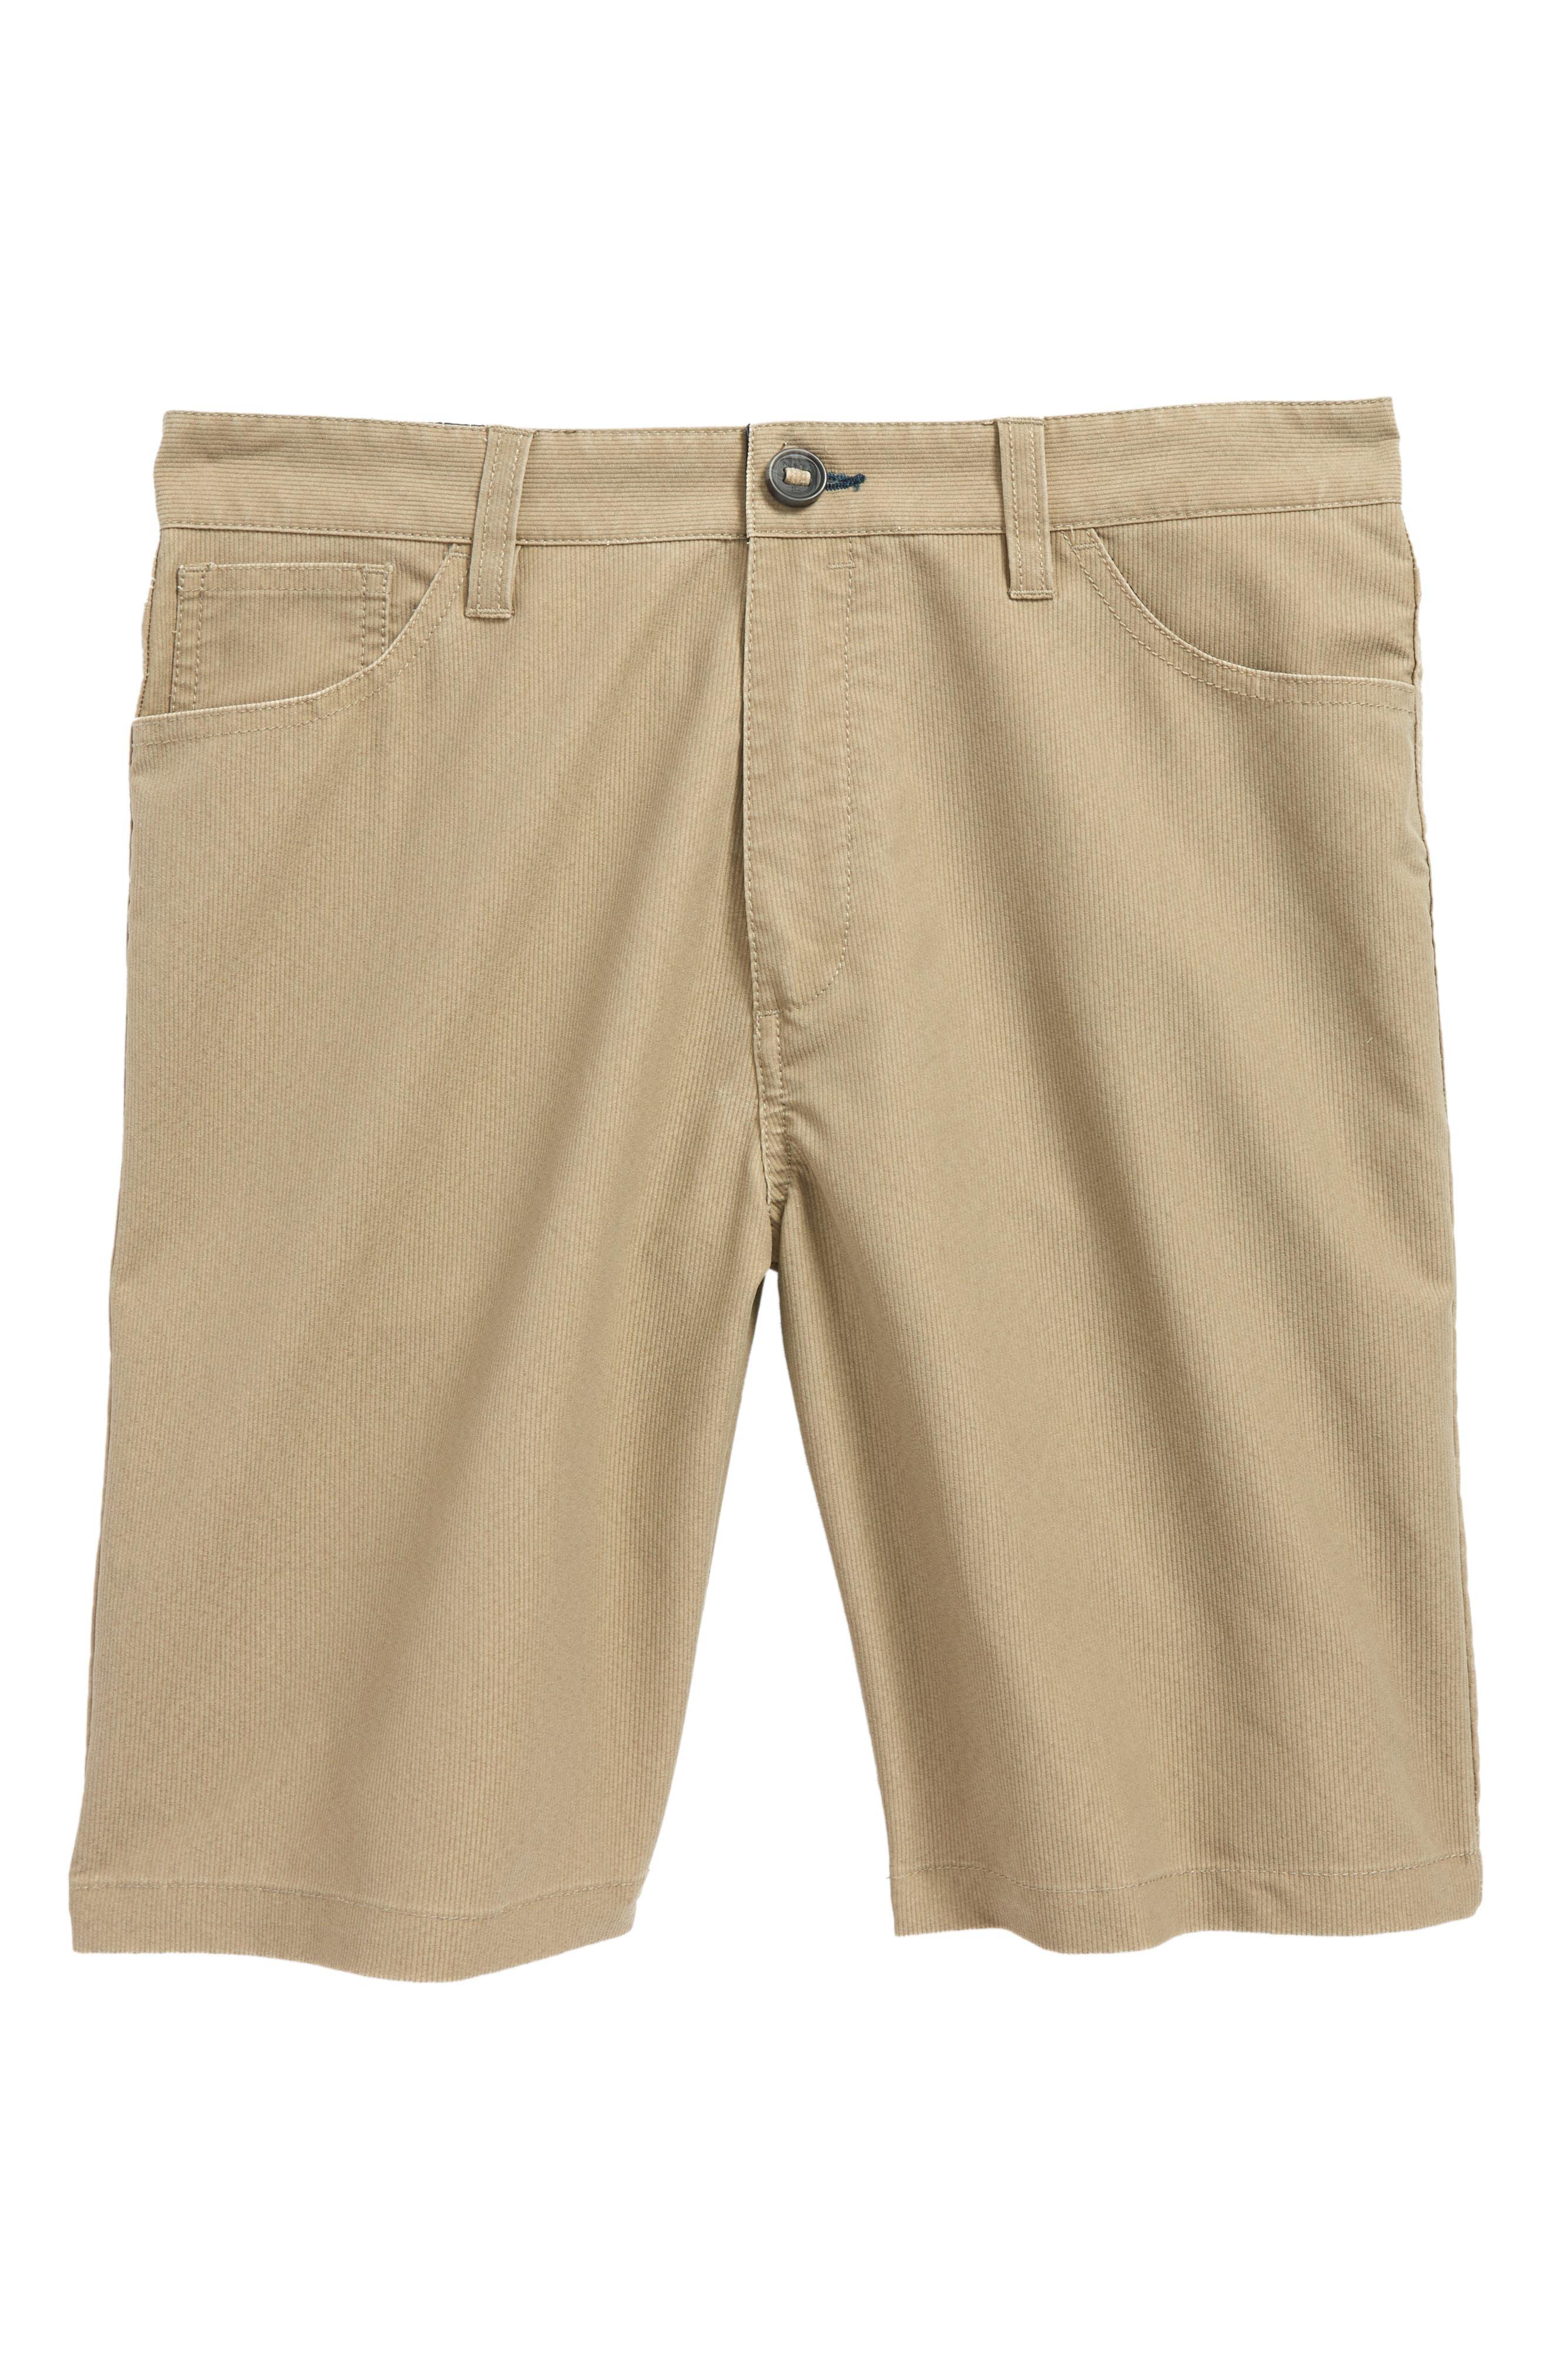 BILLABONG Outsider X Surf Corduroy Hybrid Shorts, Main, color, 259